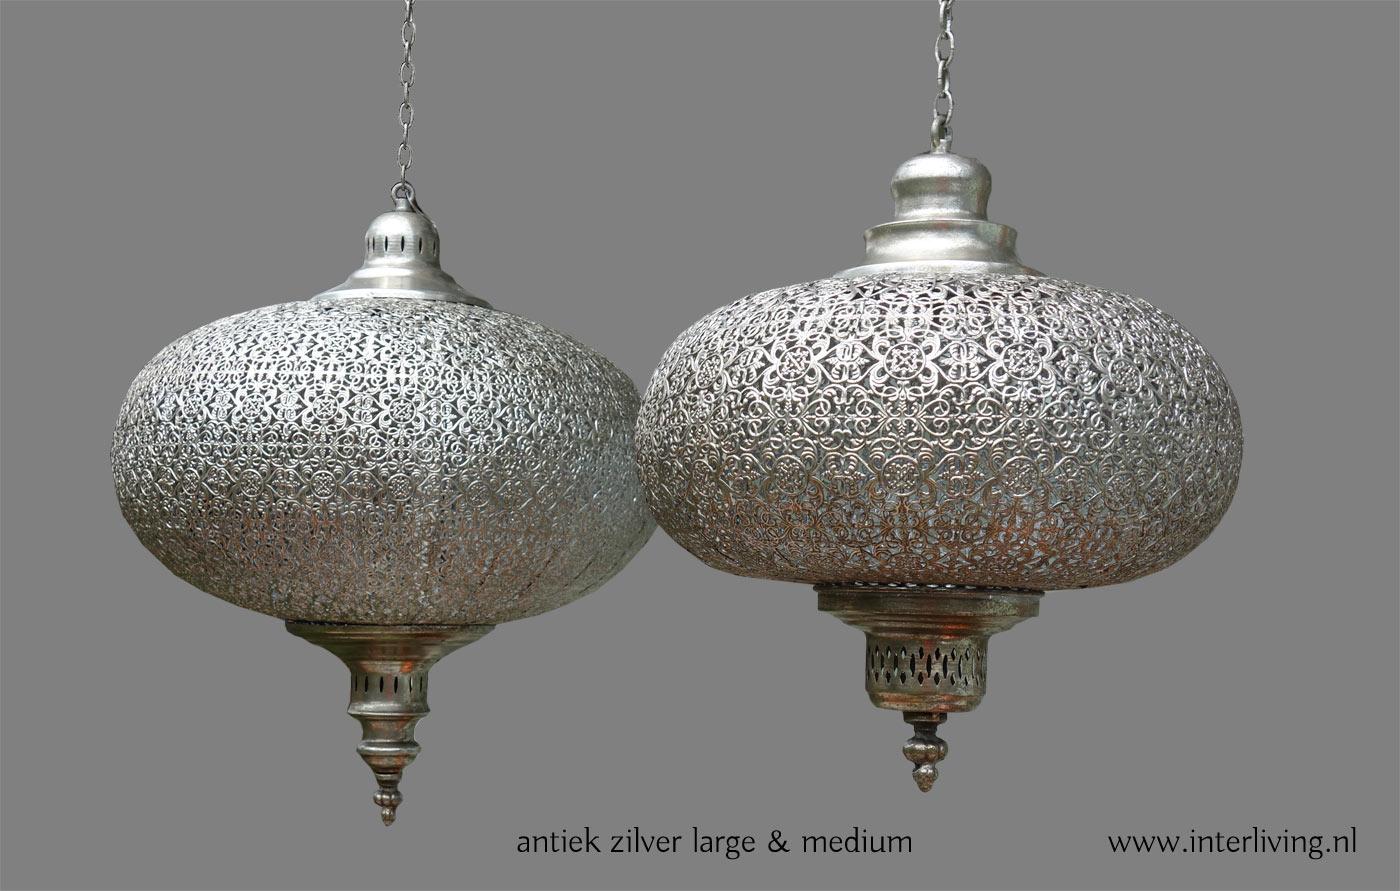 oosterse lantaarn antiek zilver